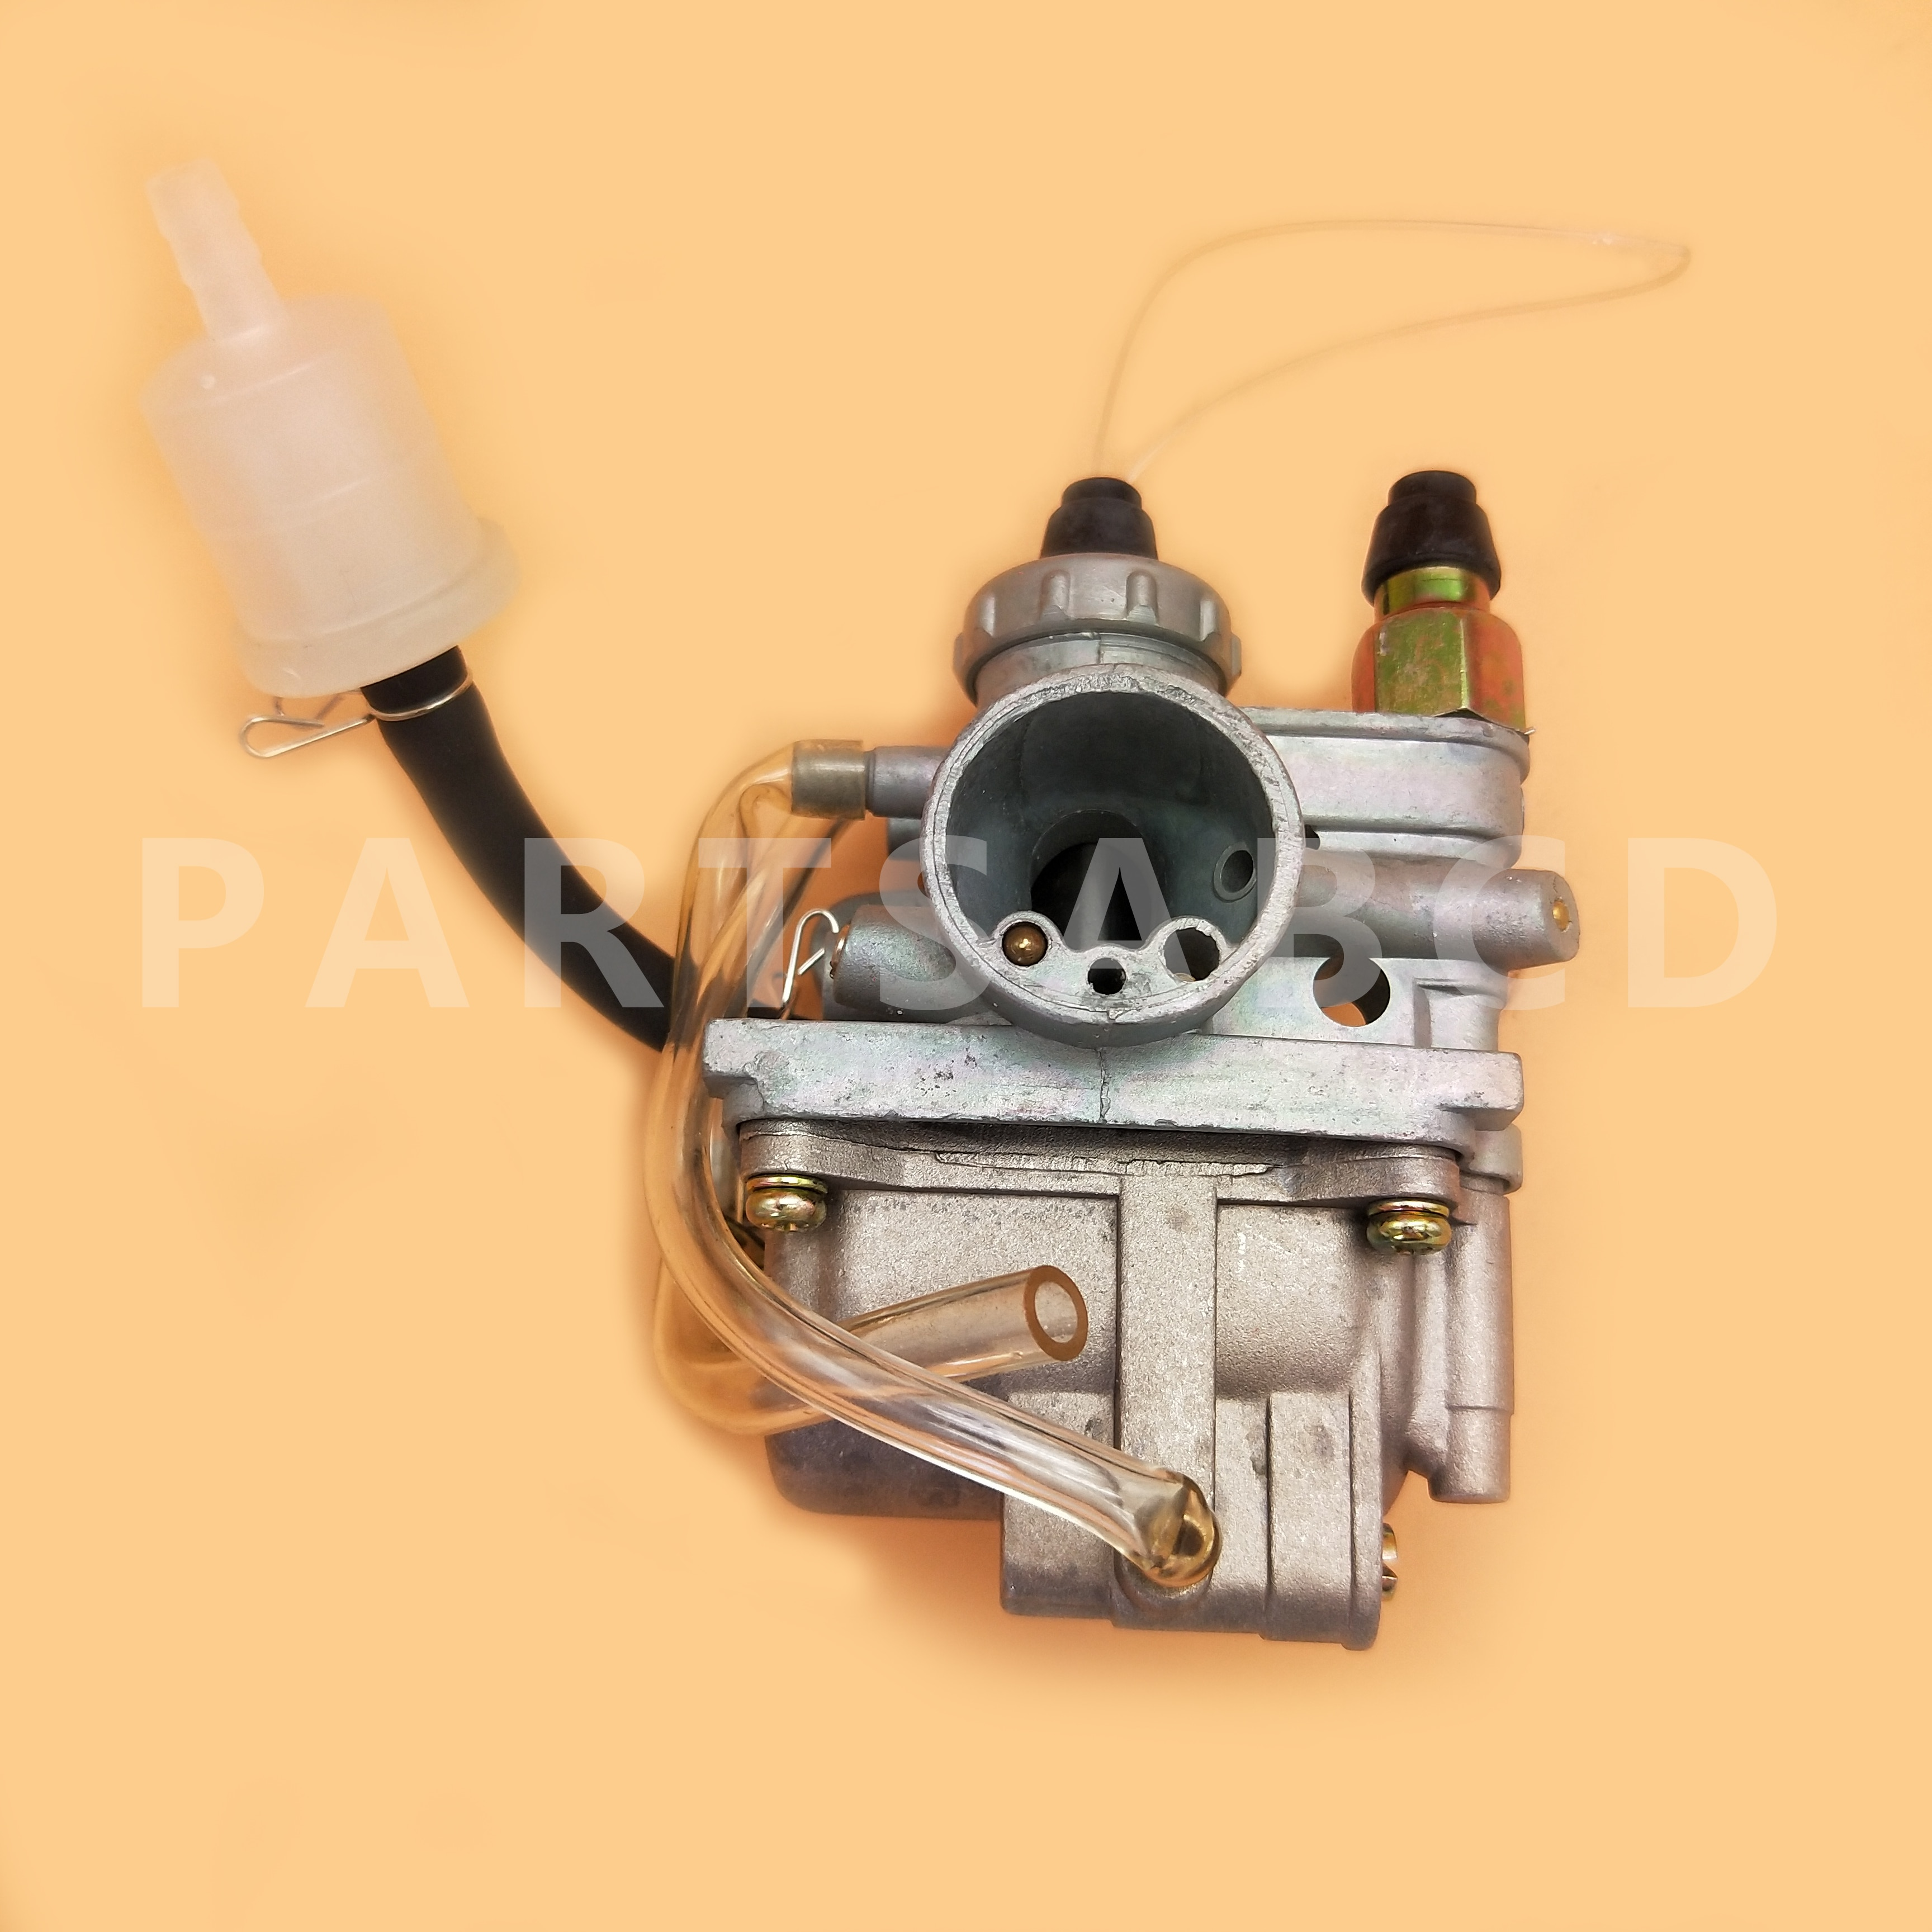 High  performance Carburetor PZ15 for Scooter TB50 TB60 D1E41QMB GEELY 50 QINGQI 50 Carb 50-90CC